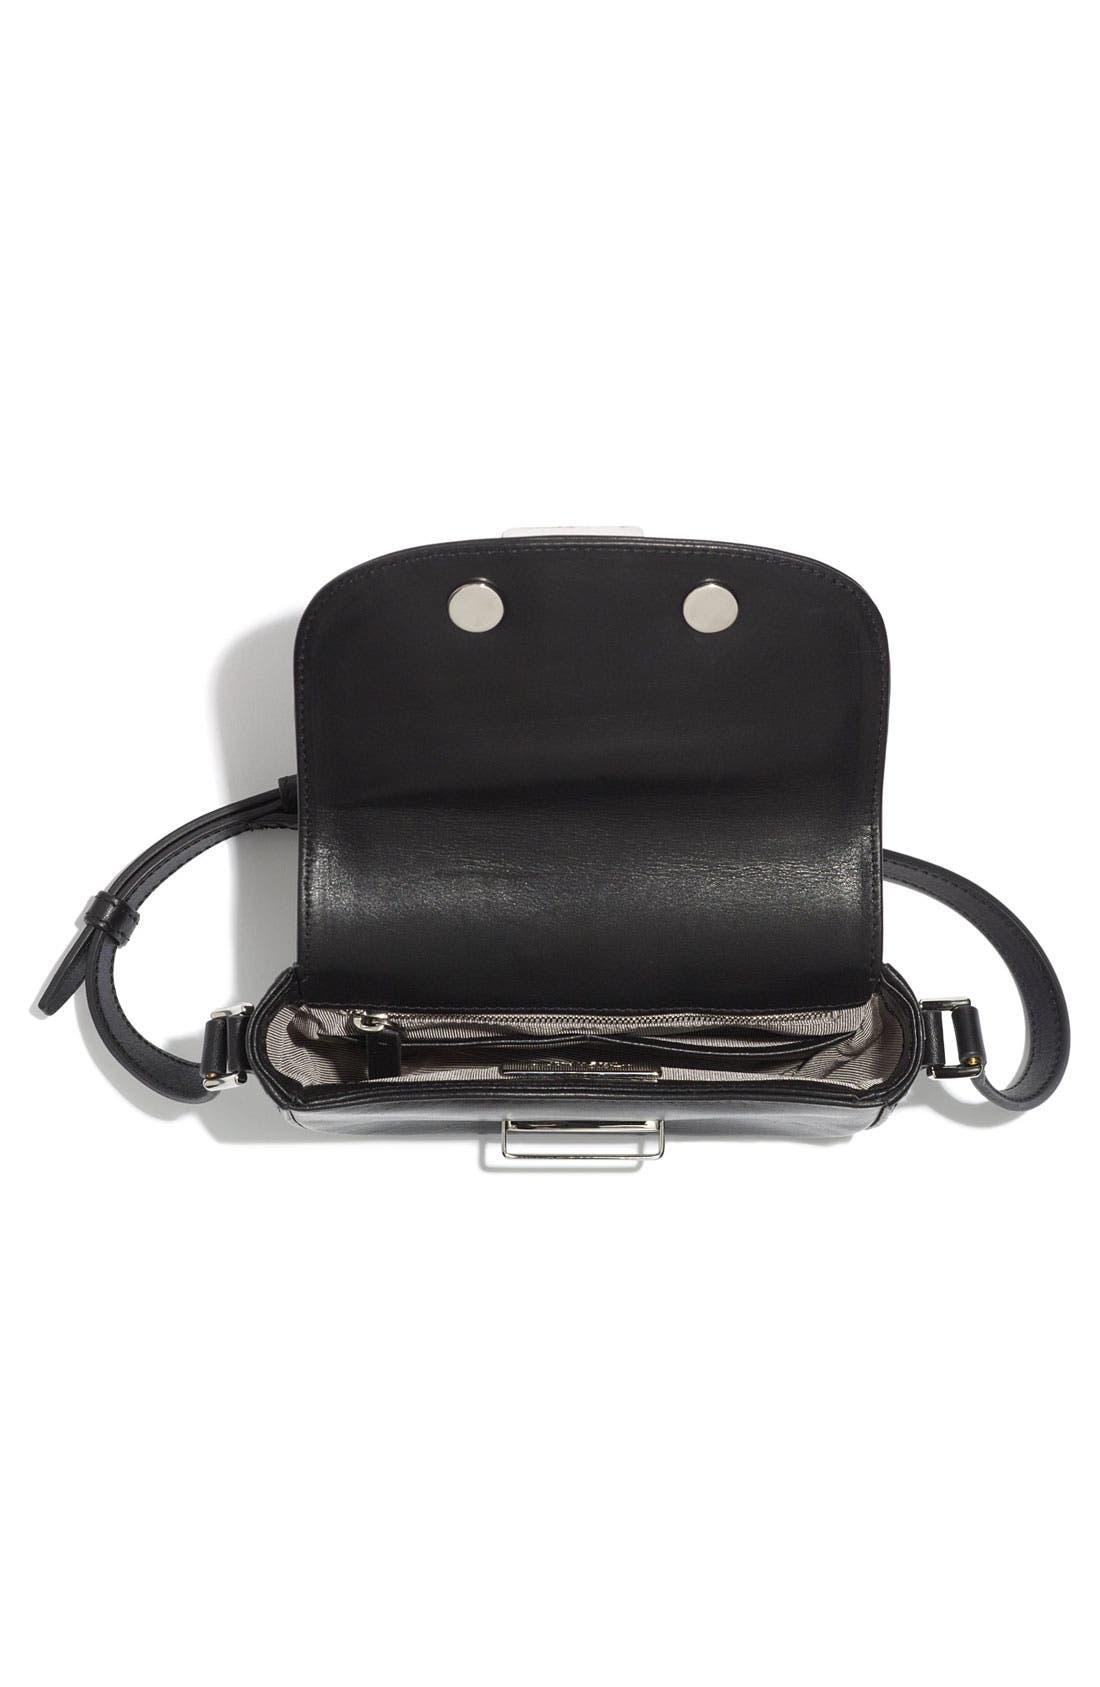 Alternate Image 3  - Jason Wu 'Mini Miss Wu' Leather Crossbody Bag